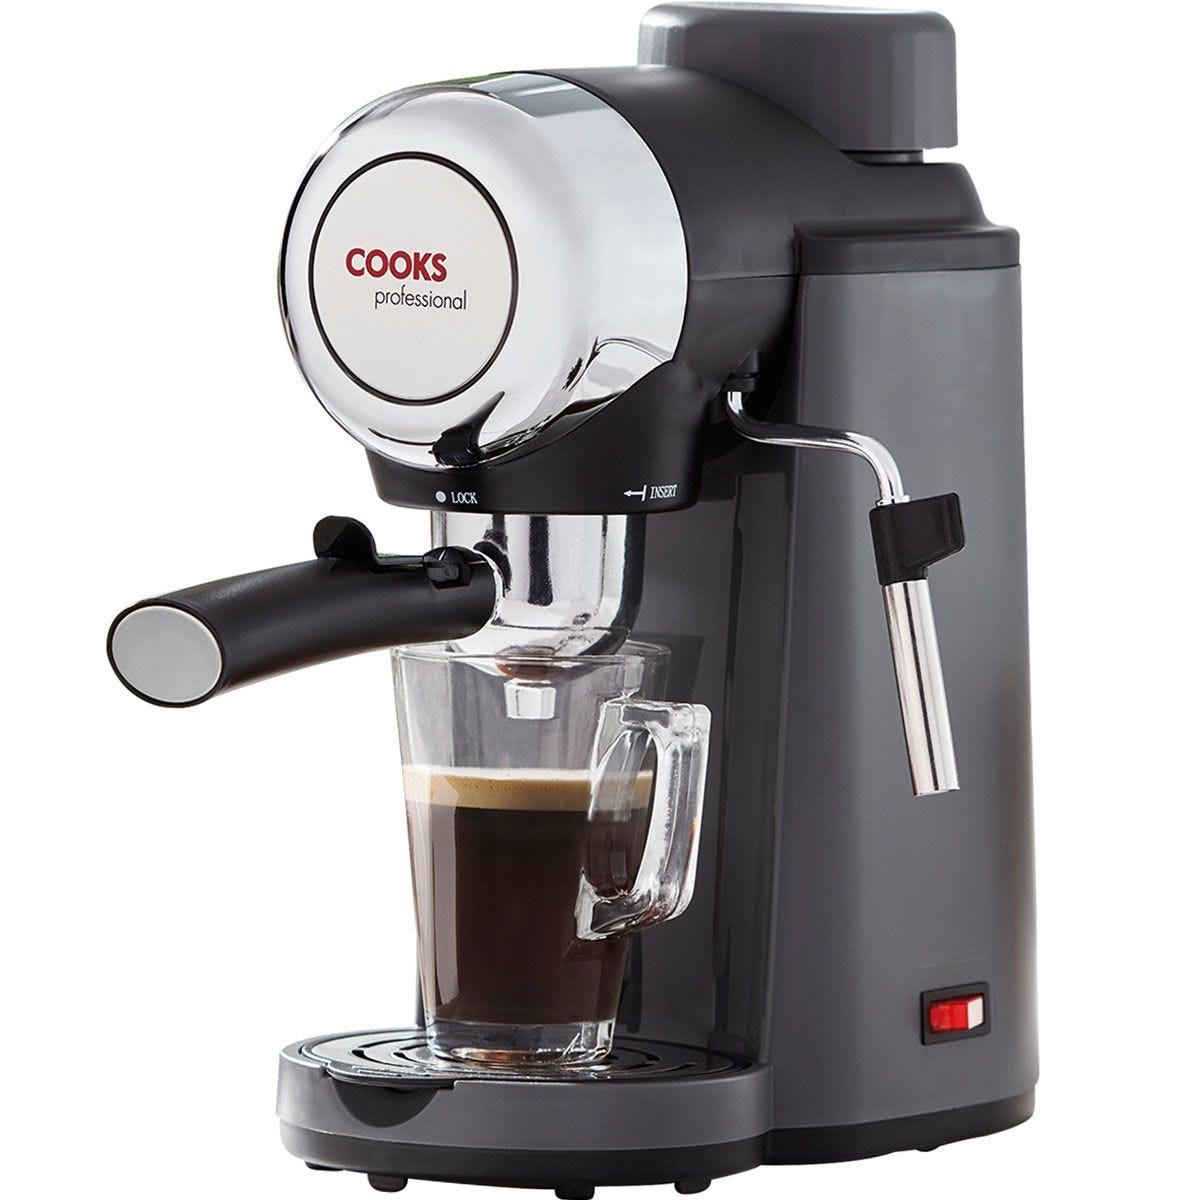 Cooks Professional Espresso Coffee Maker - Grey